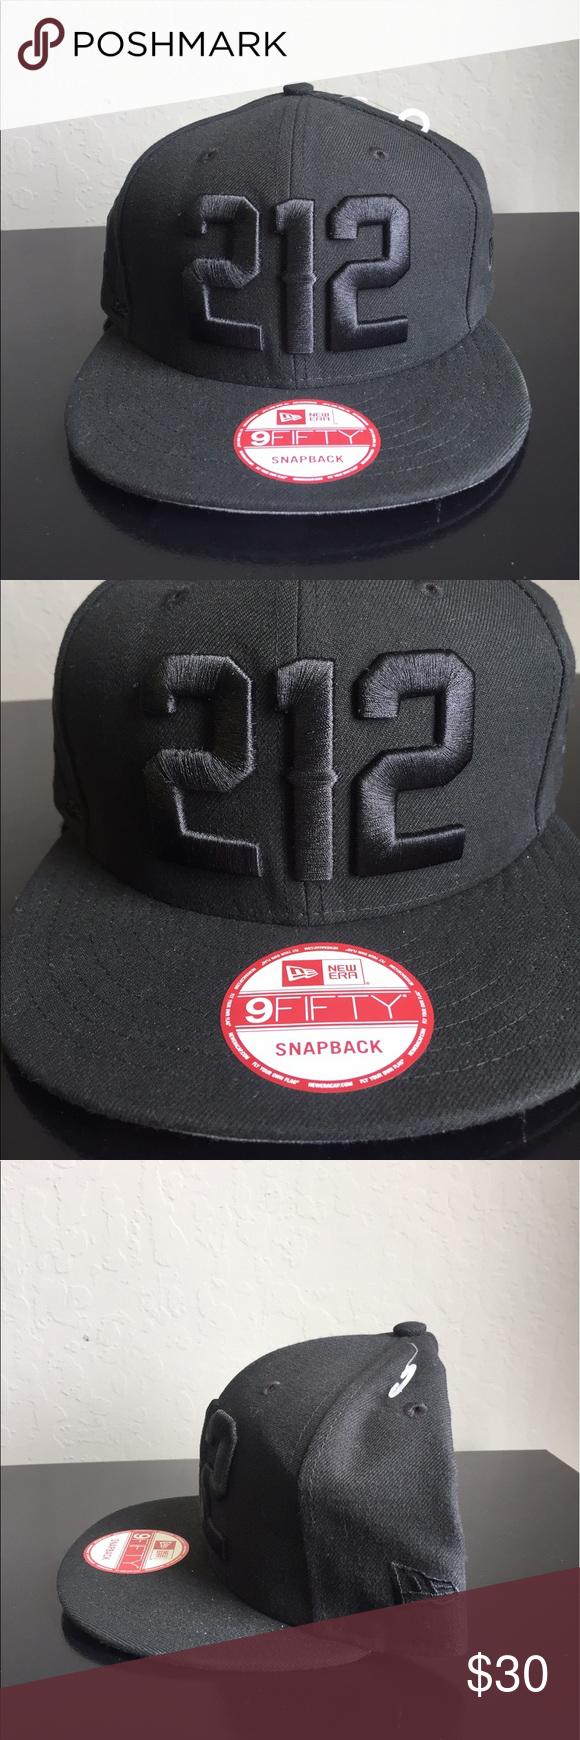 reputable site 1e49d 8038b 1 DAY SALE❗️New Era 212 Area Code Yankees Hat New Era 9Fifty